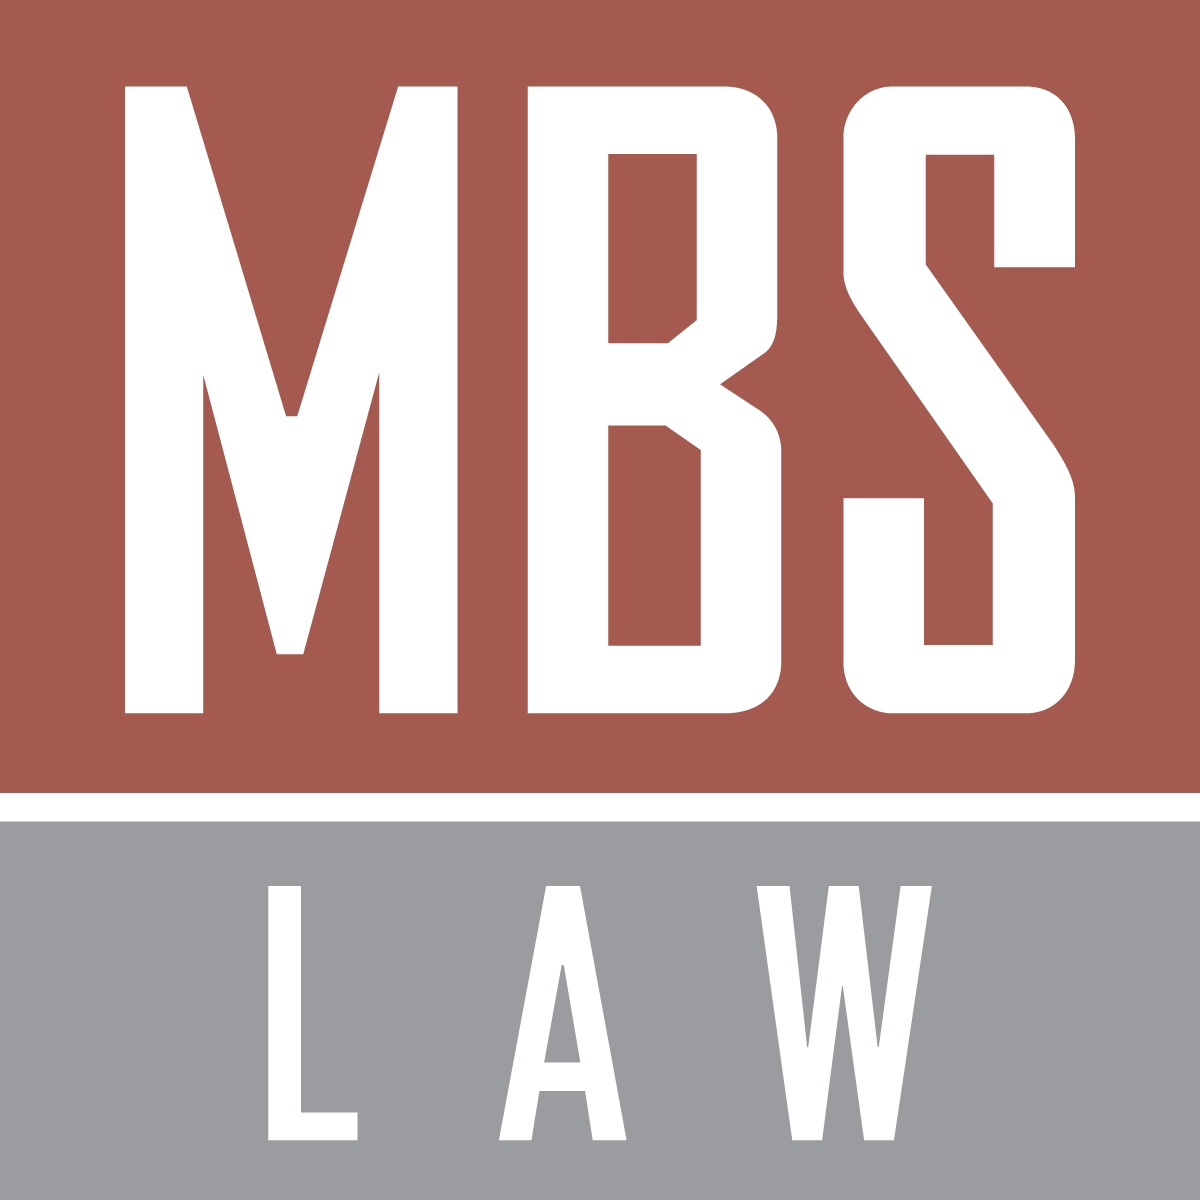 MBSLaw, PLLC